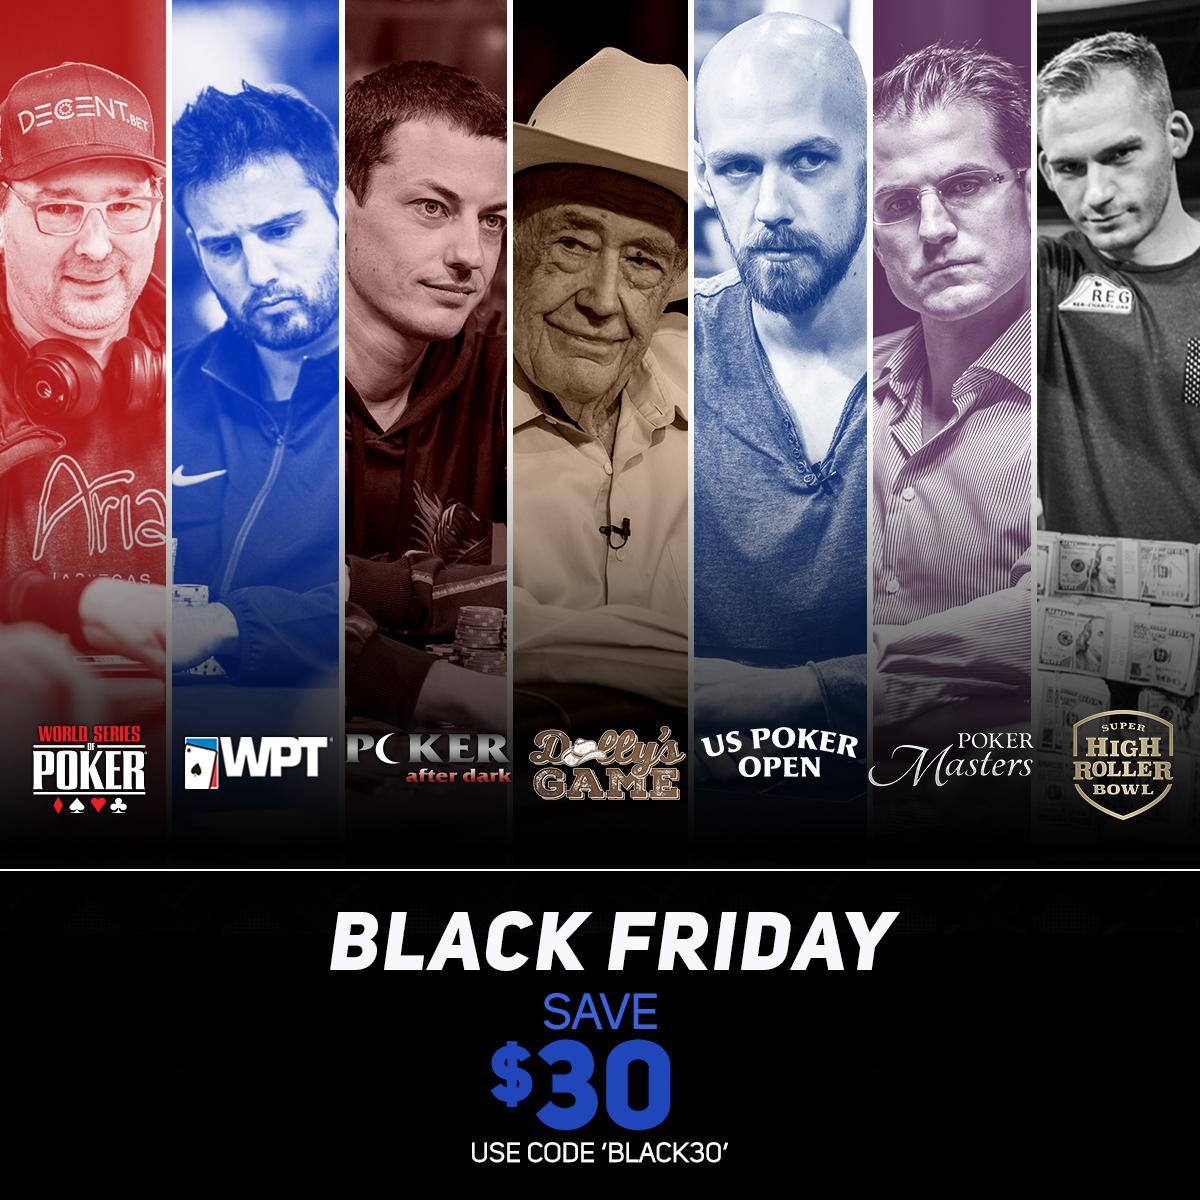 PokerGO Black Friday Sale - $30 Off $69